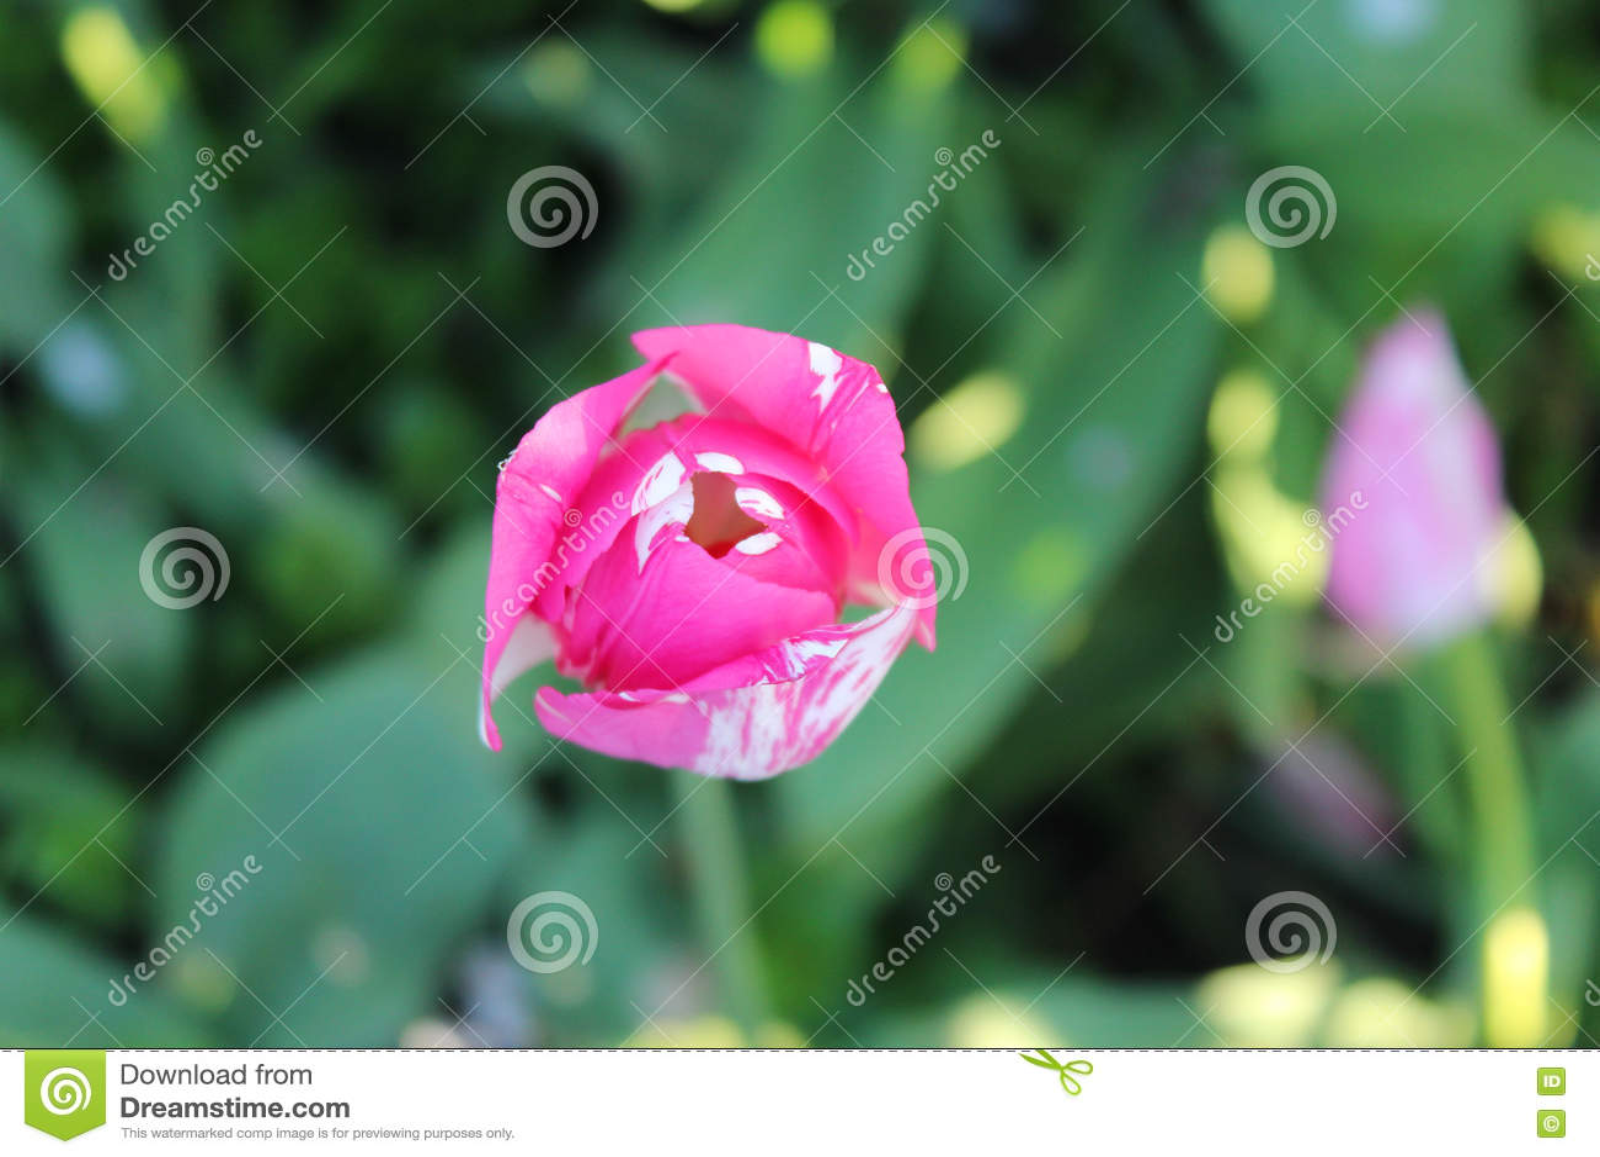 seule fleur de tulipe dans le jardin magenta et blanc vue de ci